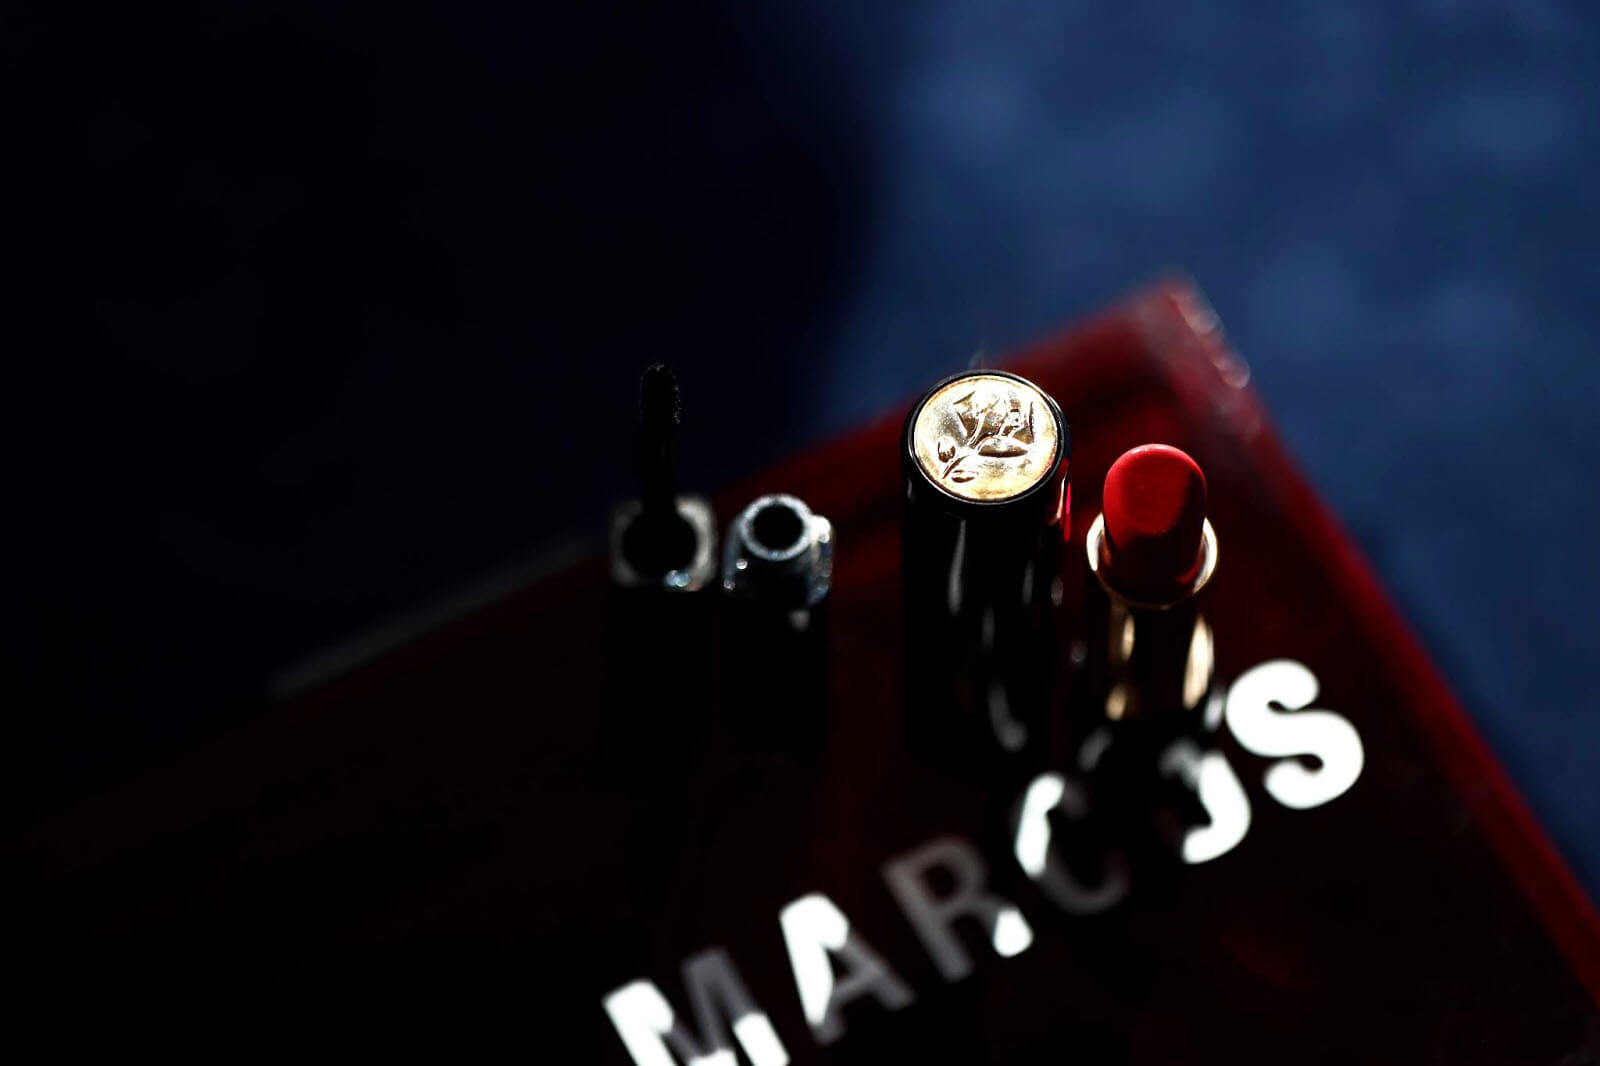 Lancôme Mert Marcus L'Absolu Rouge 198 Rouge Flamboyant swatch